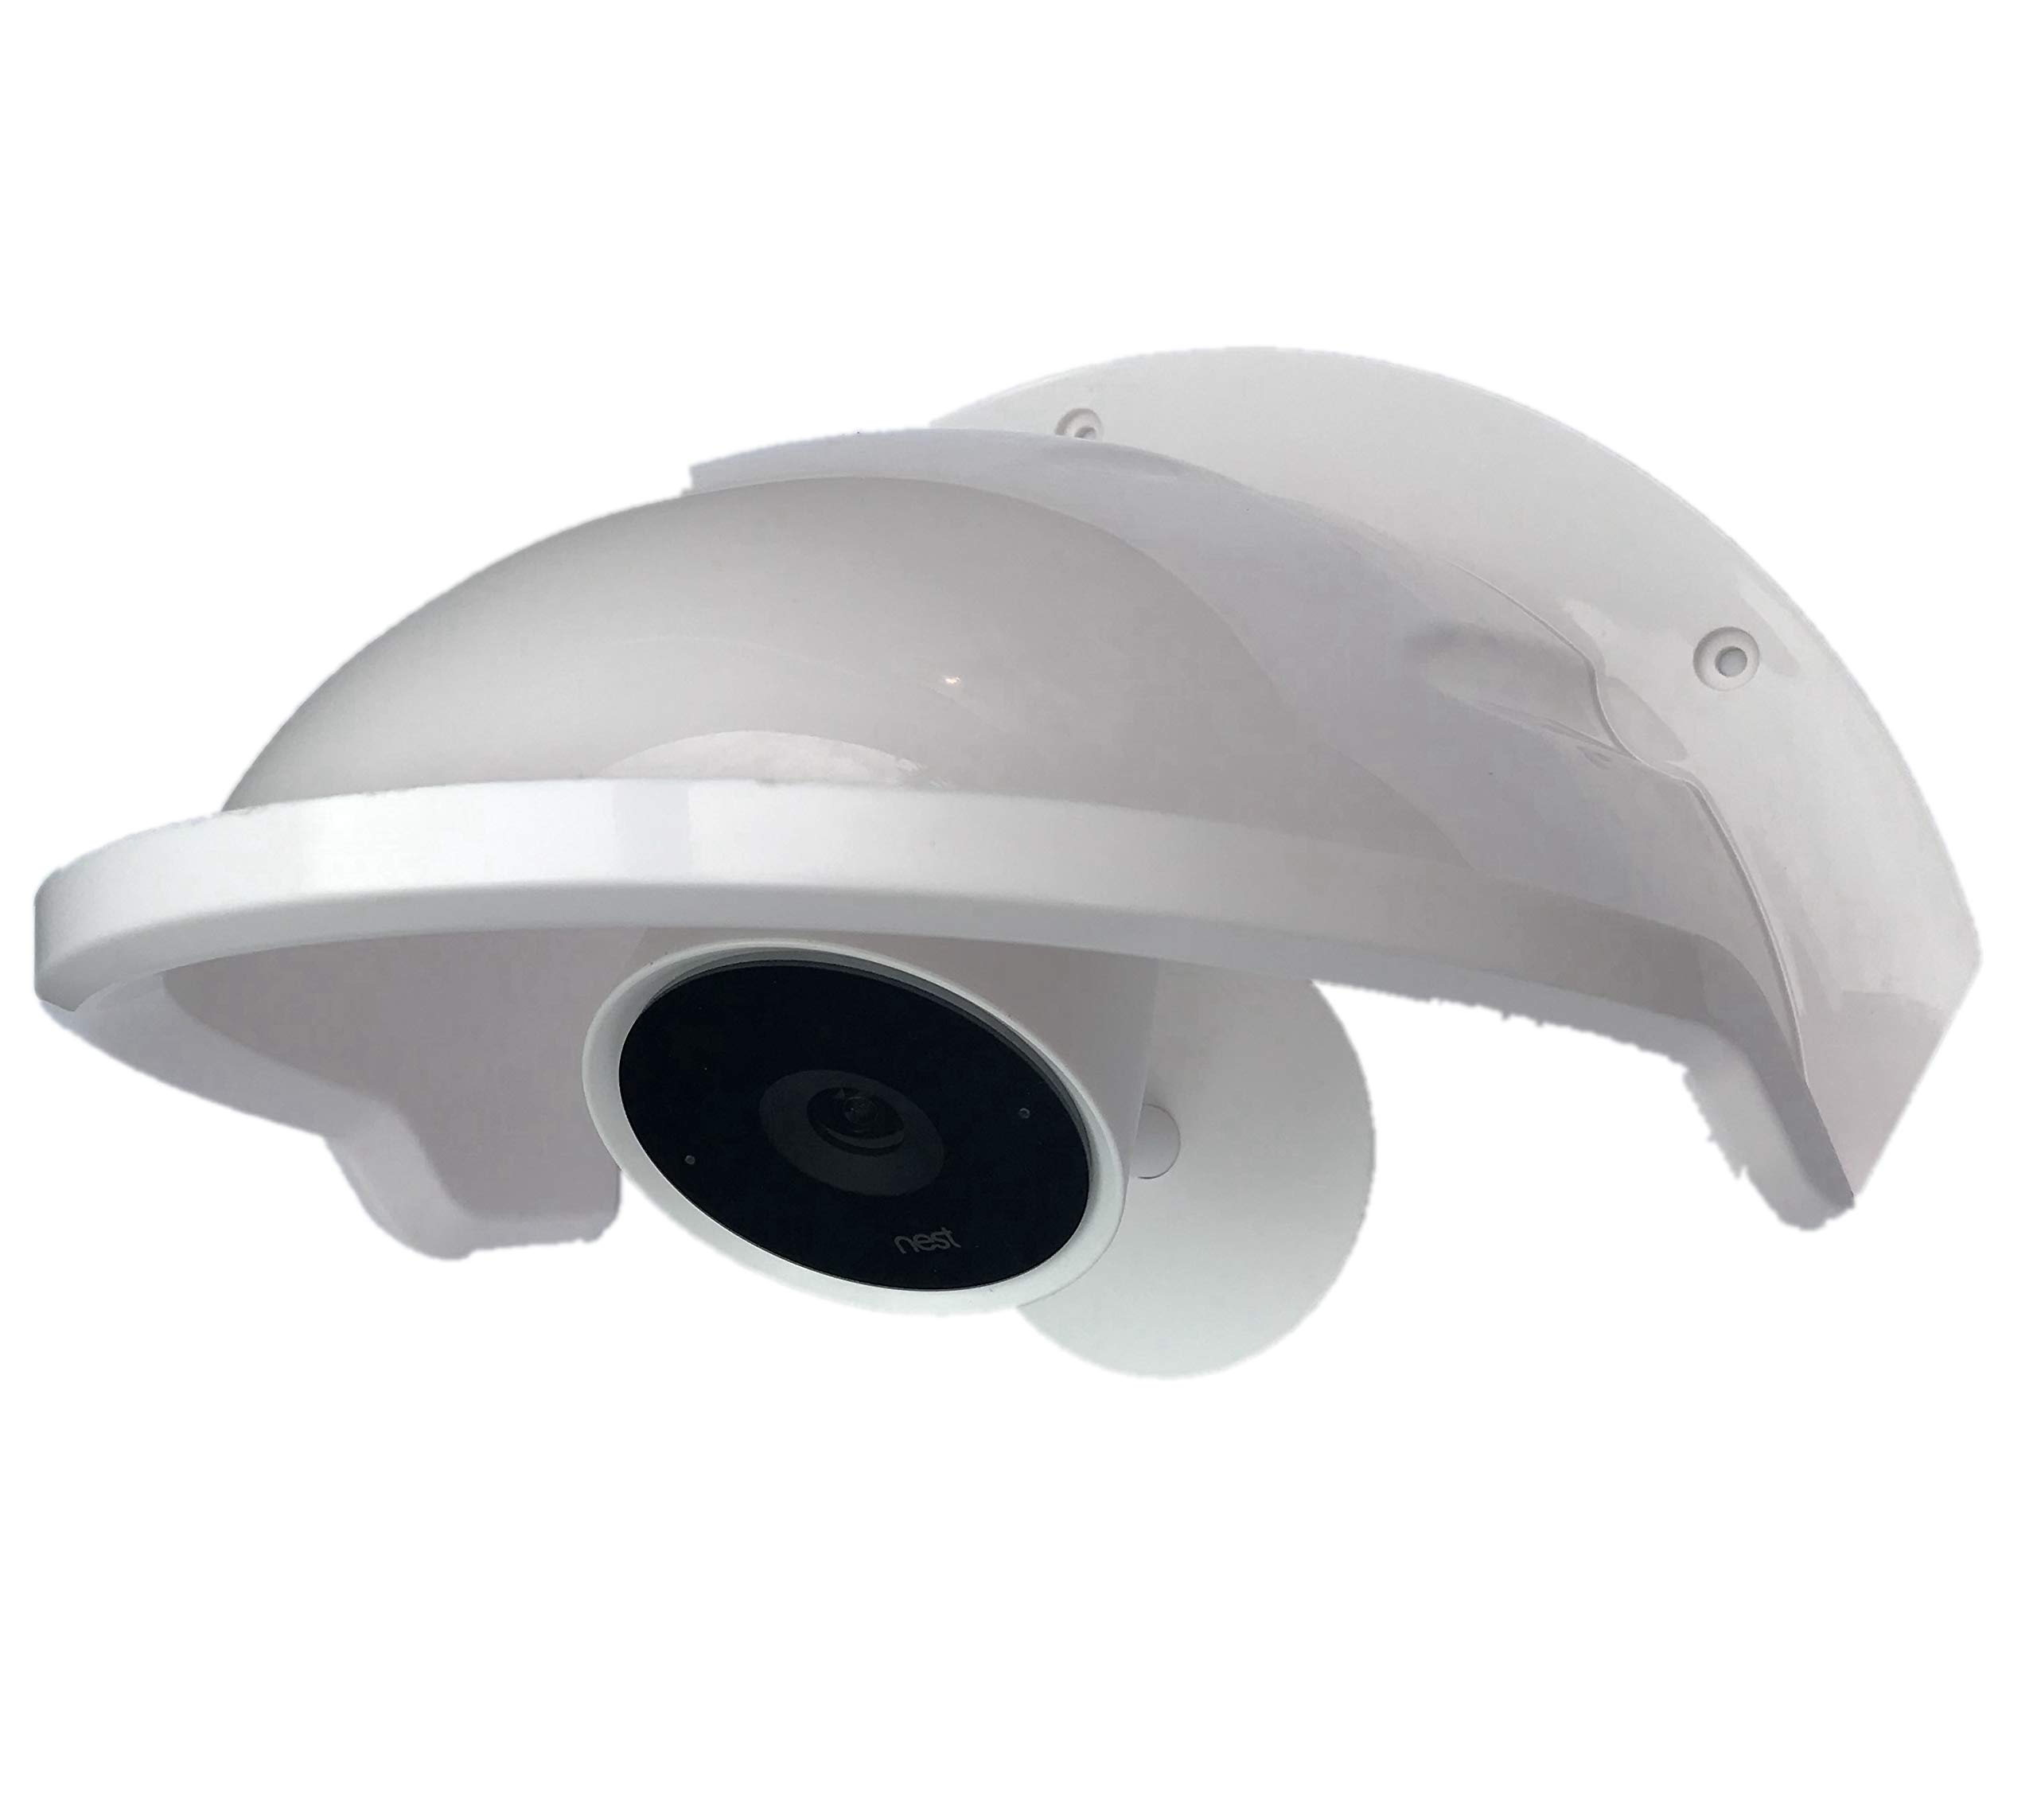 Universal Sun Rain Shade Camera Cover Shield for Nest/Ring/Arlo/Dome/Bullet Outdoor Camera - White (10)